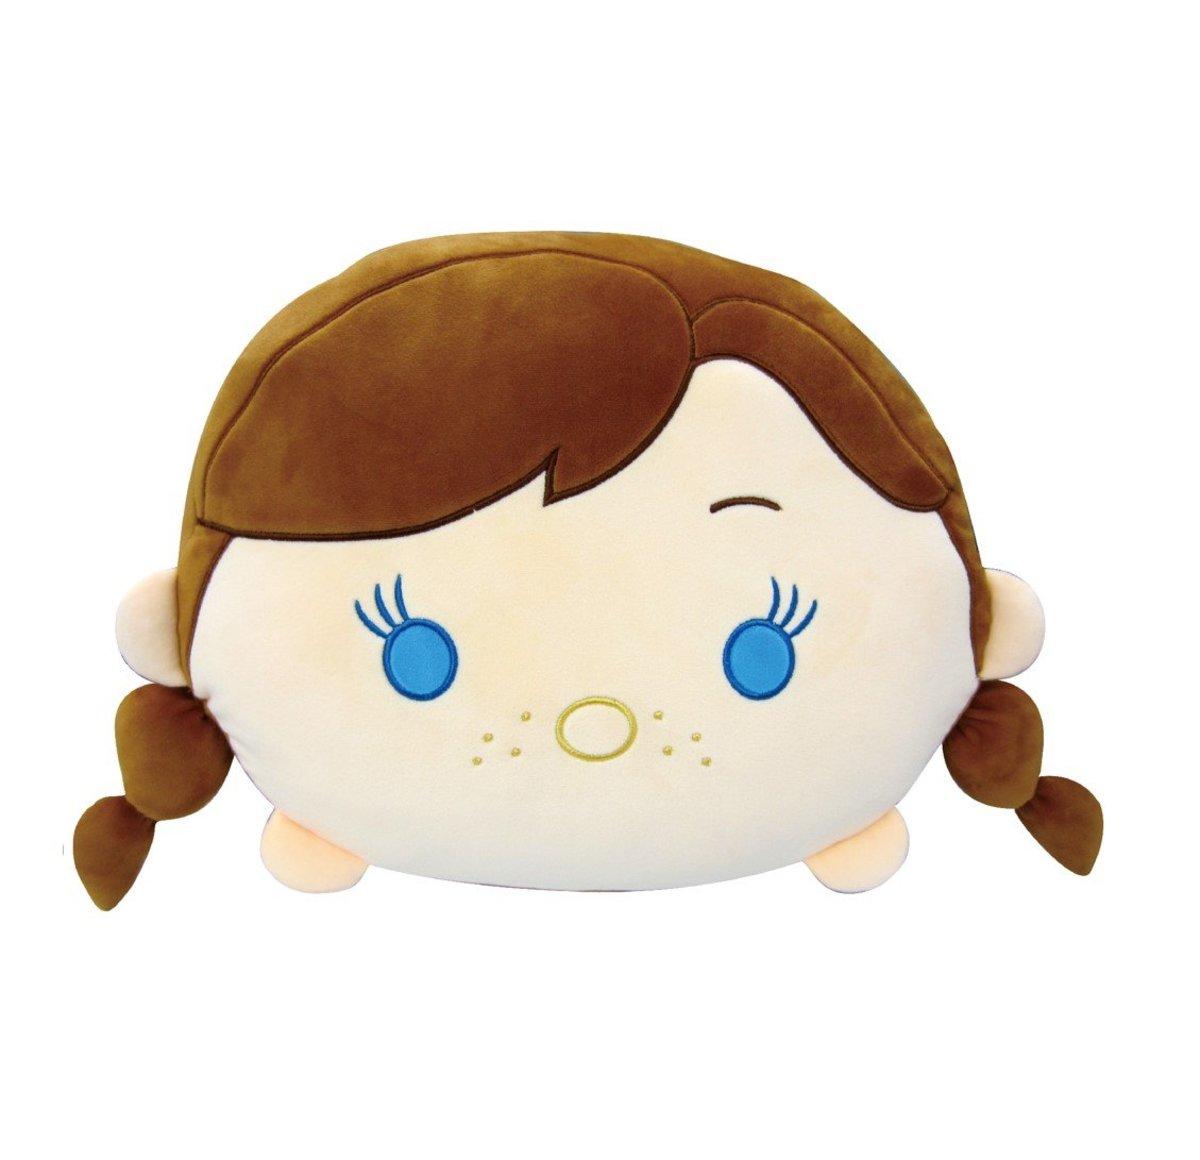 Cushion (Anna)(Licensed by Disney)